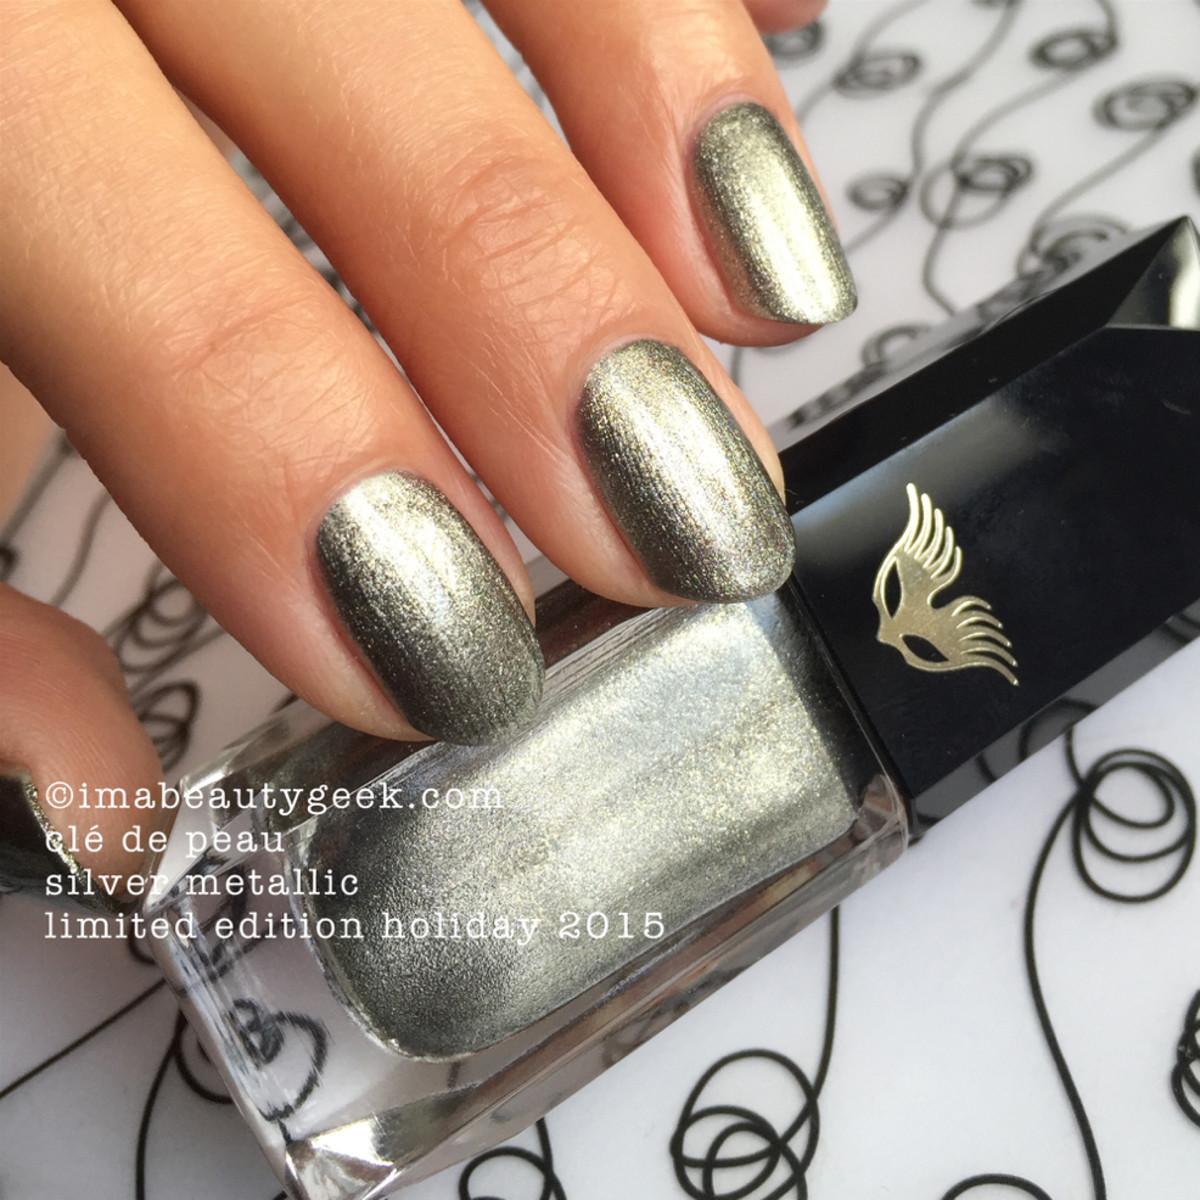 Cle de Peau Beauty Silver Metallic Nail Polish Trio Holiday 2015